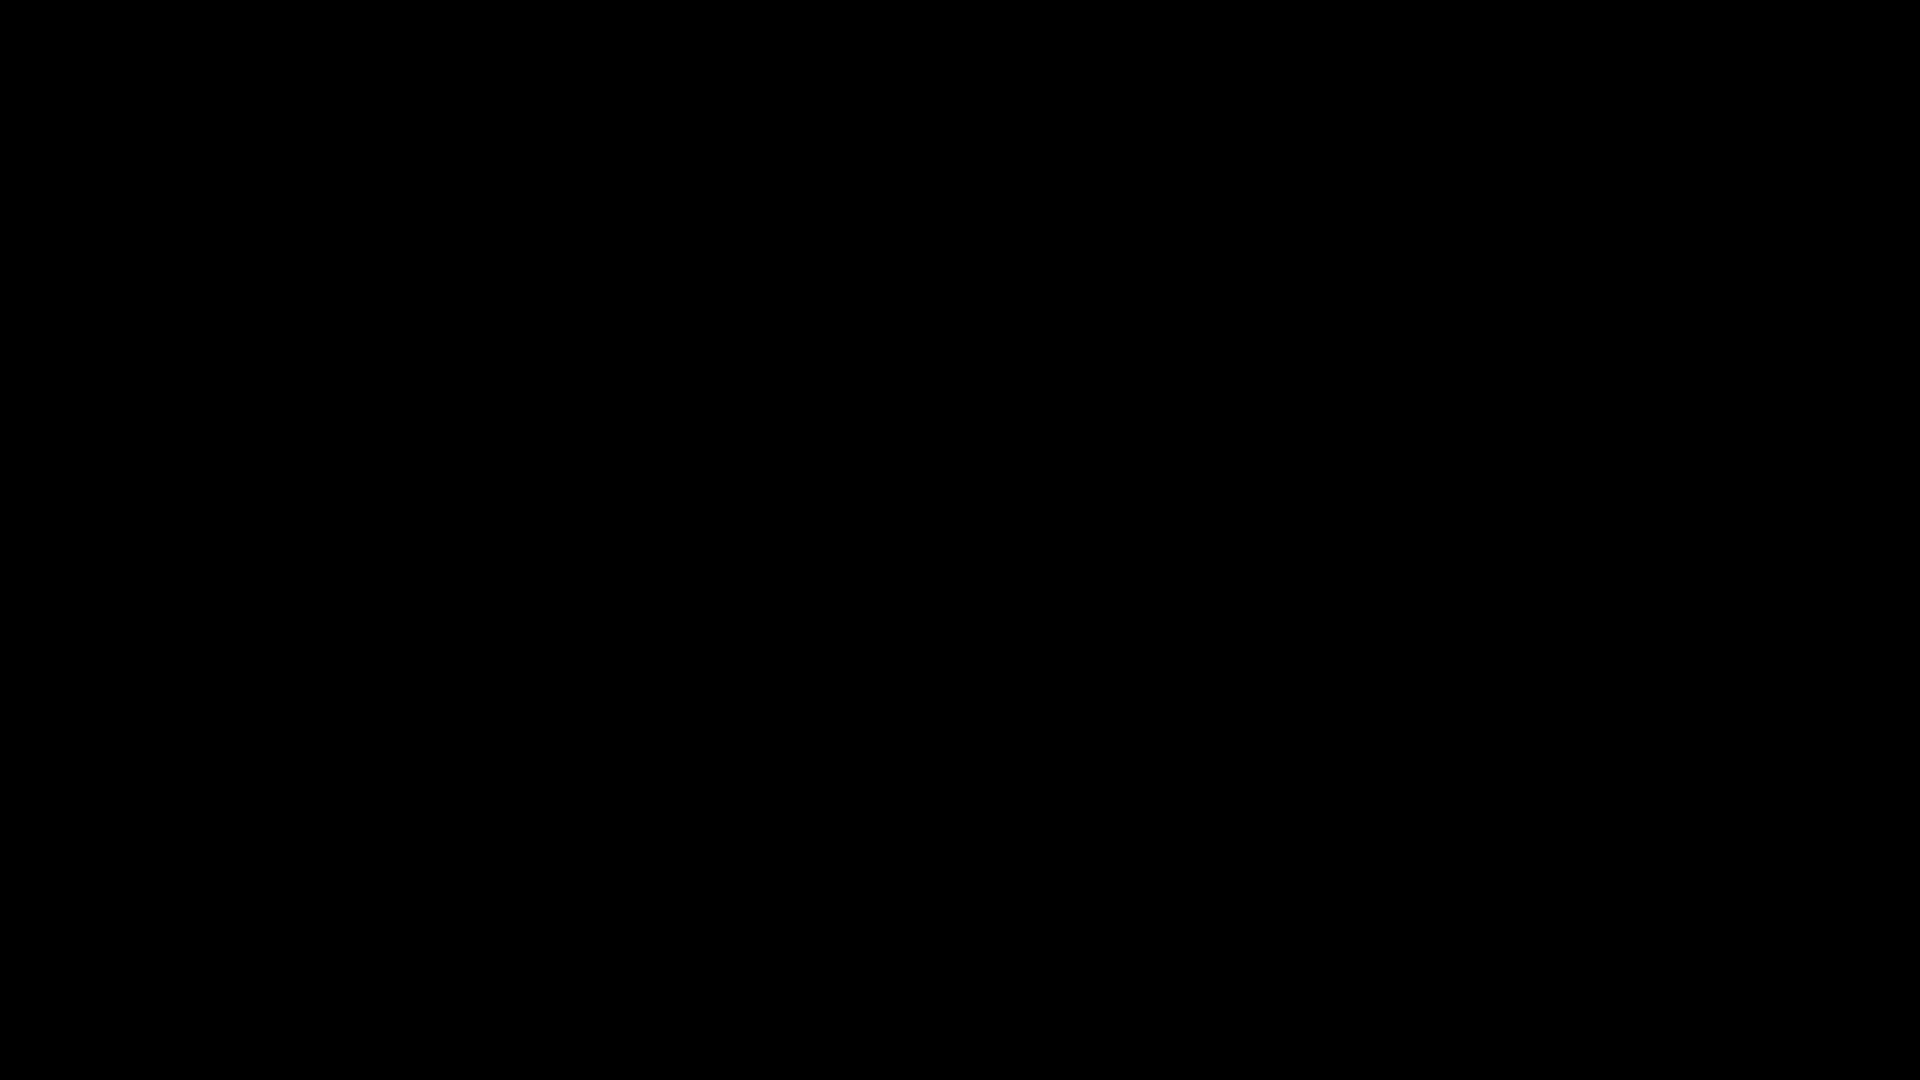 Mengaliro Media Website Logo Black.png